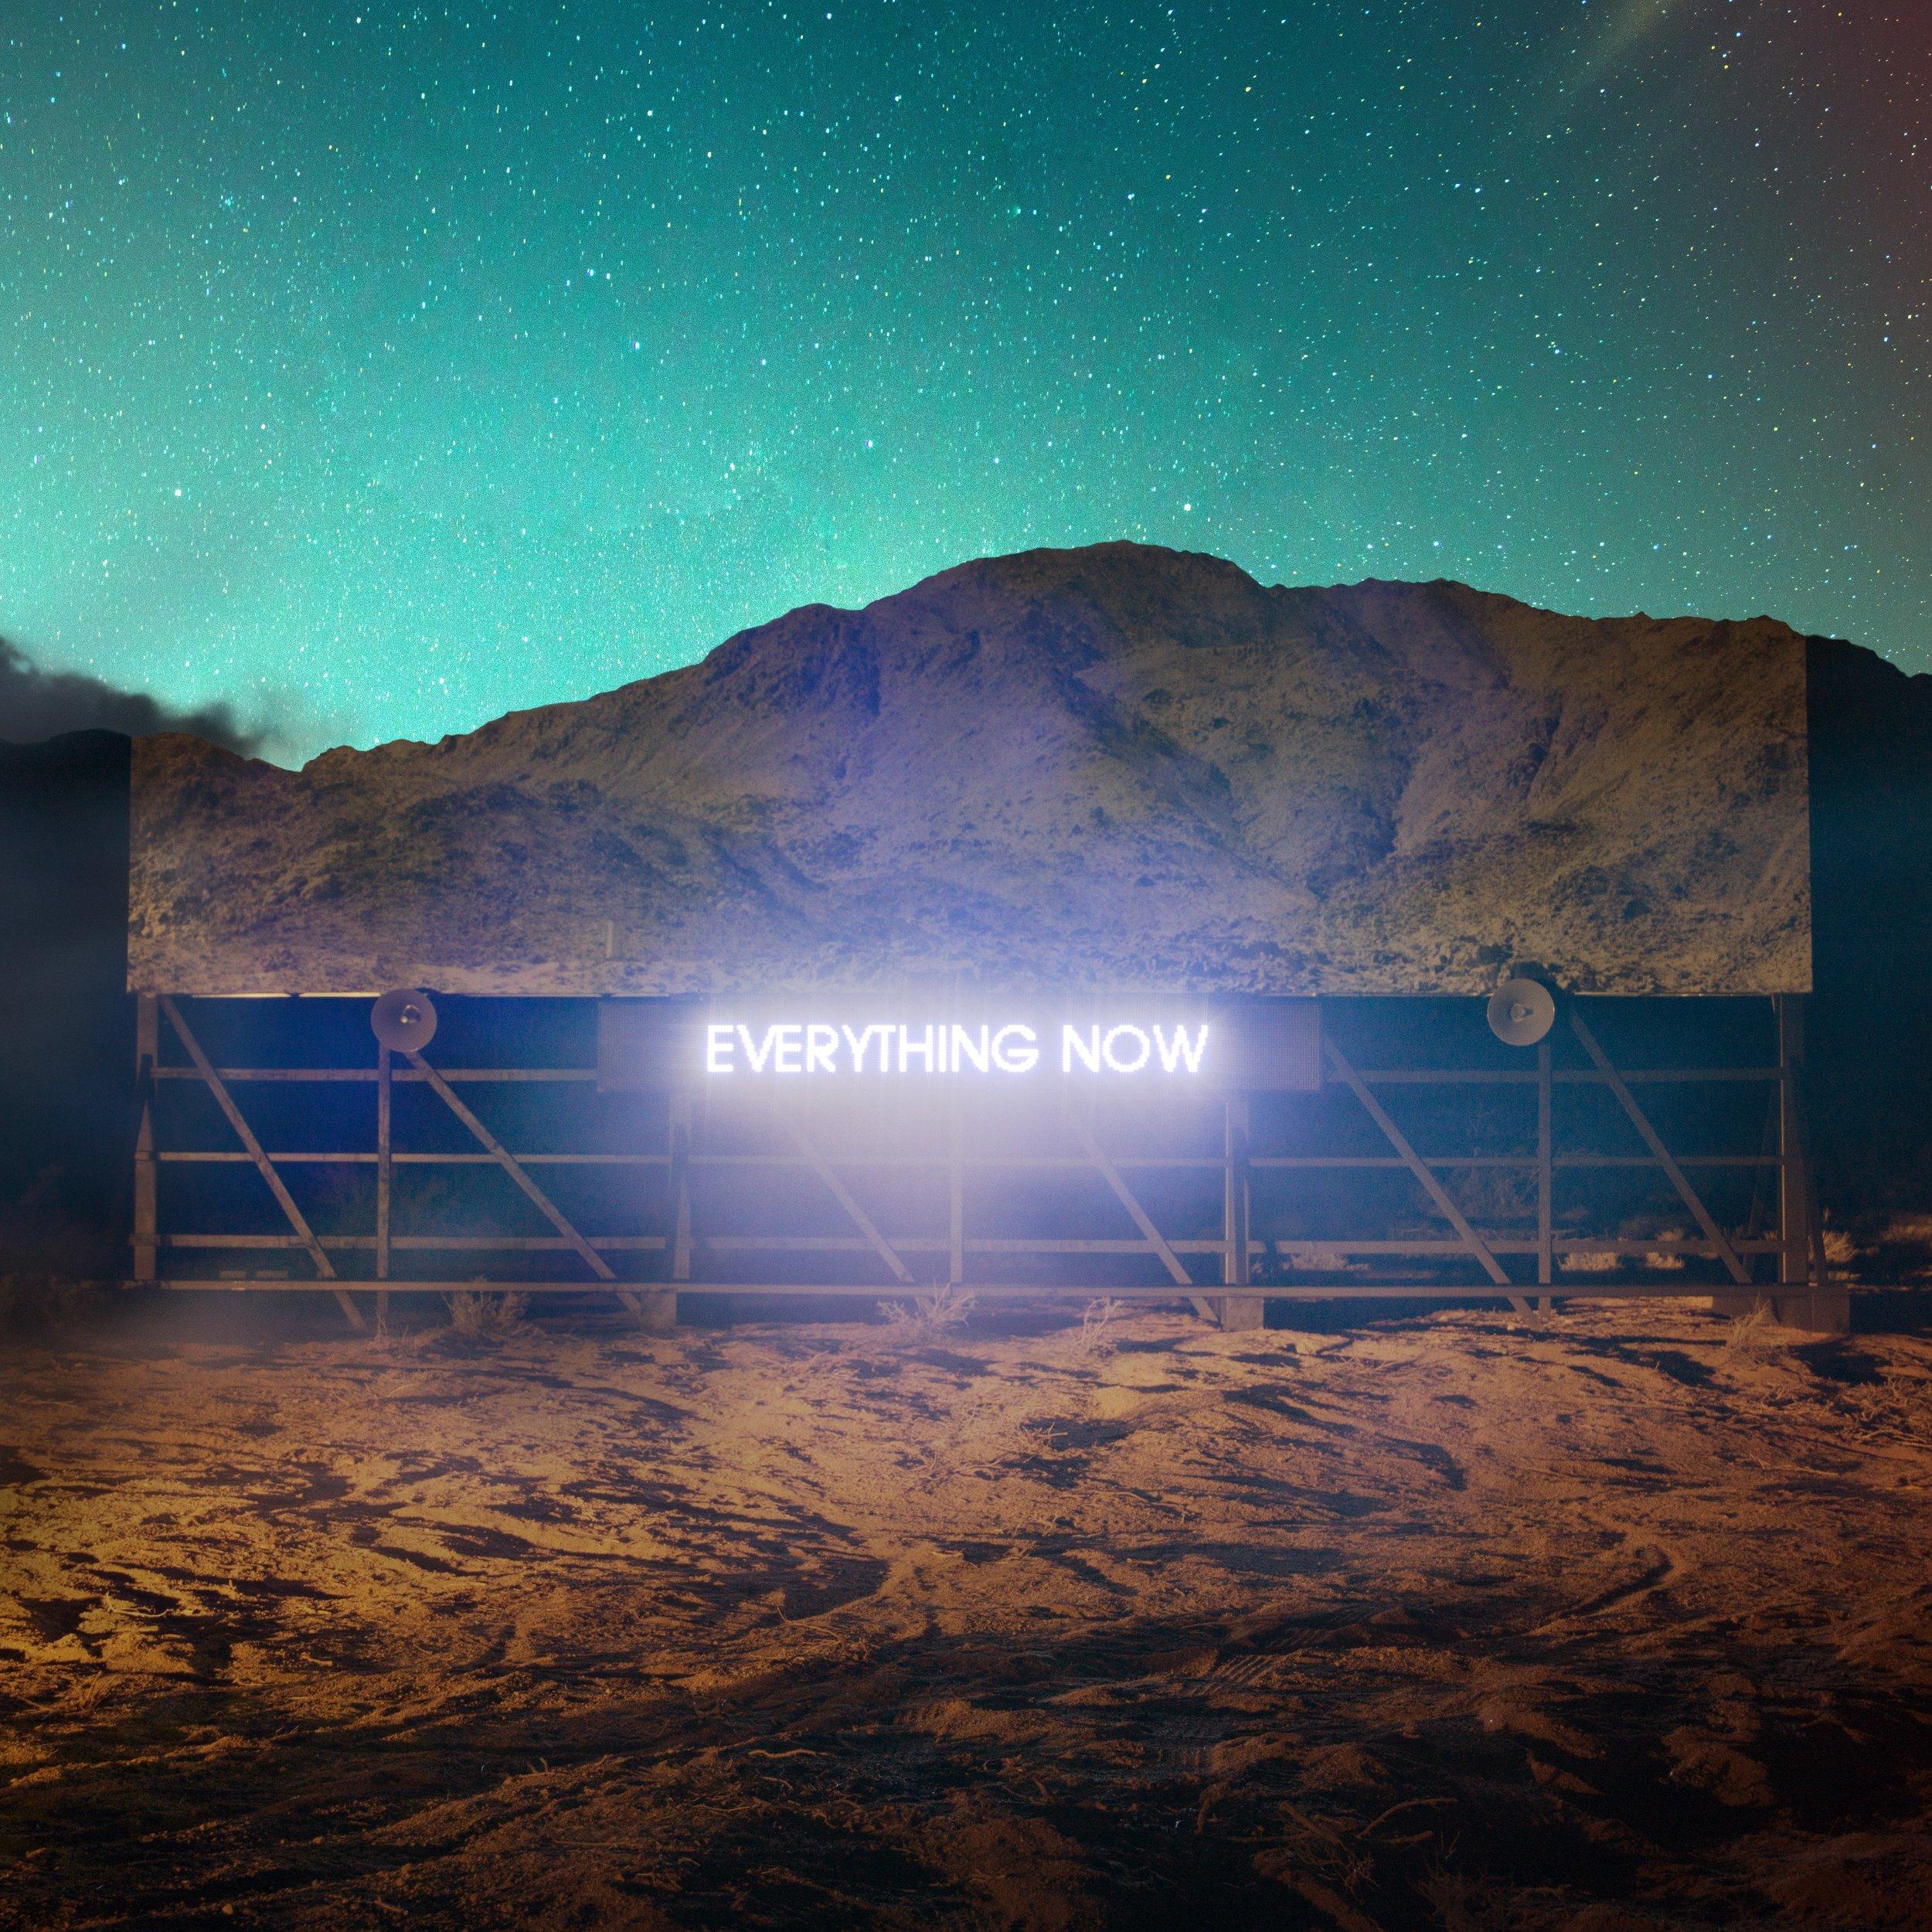 Arcade-Fire-Everything-Now-Night-Version.jpg